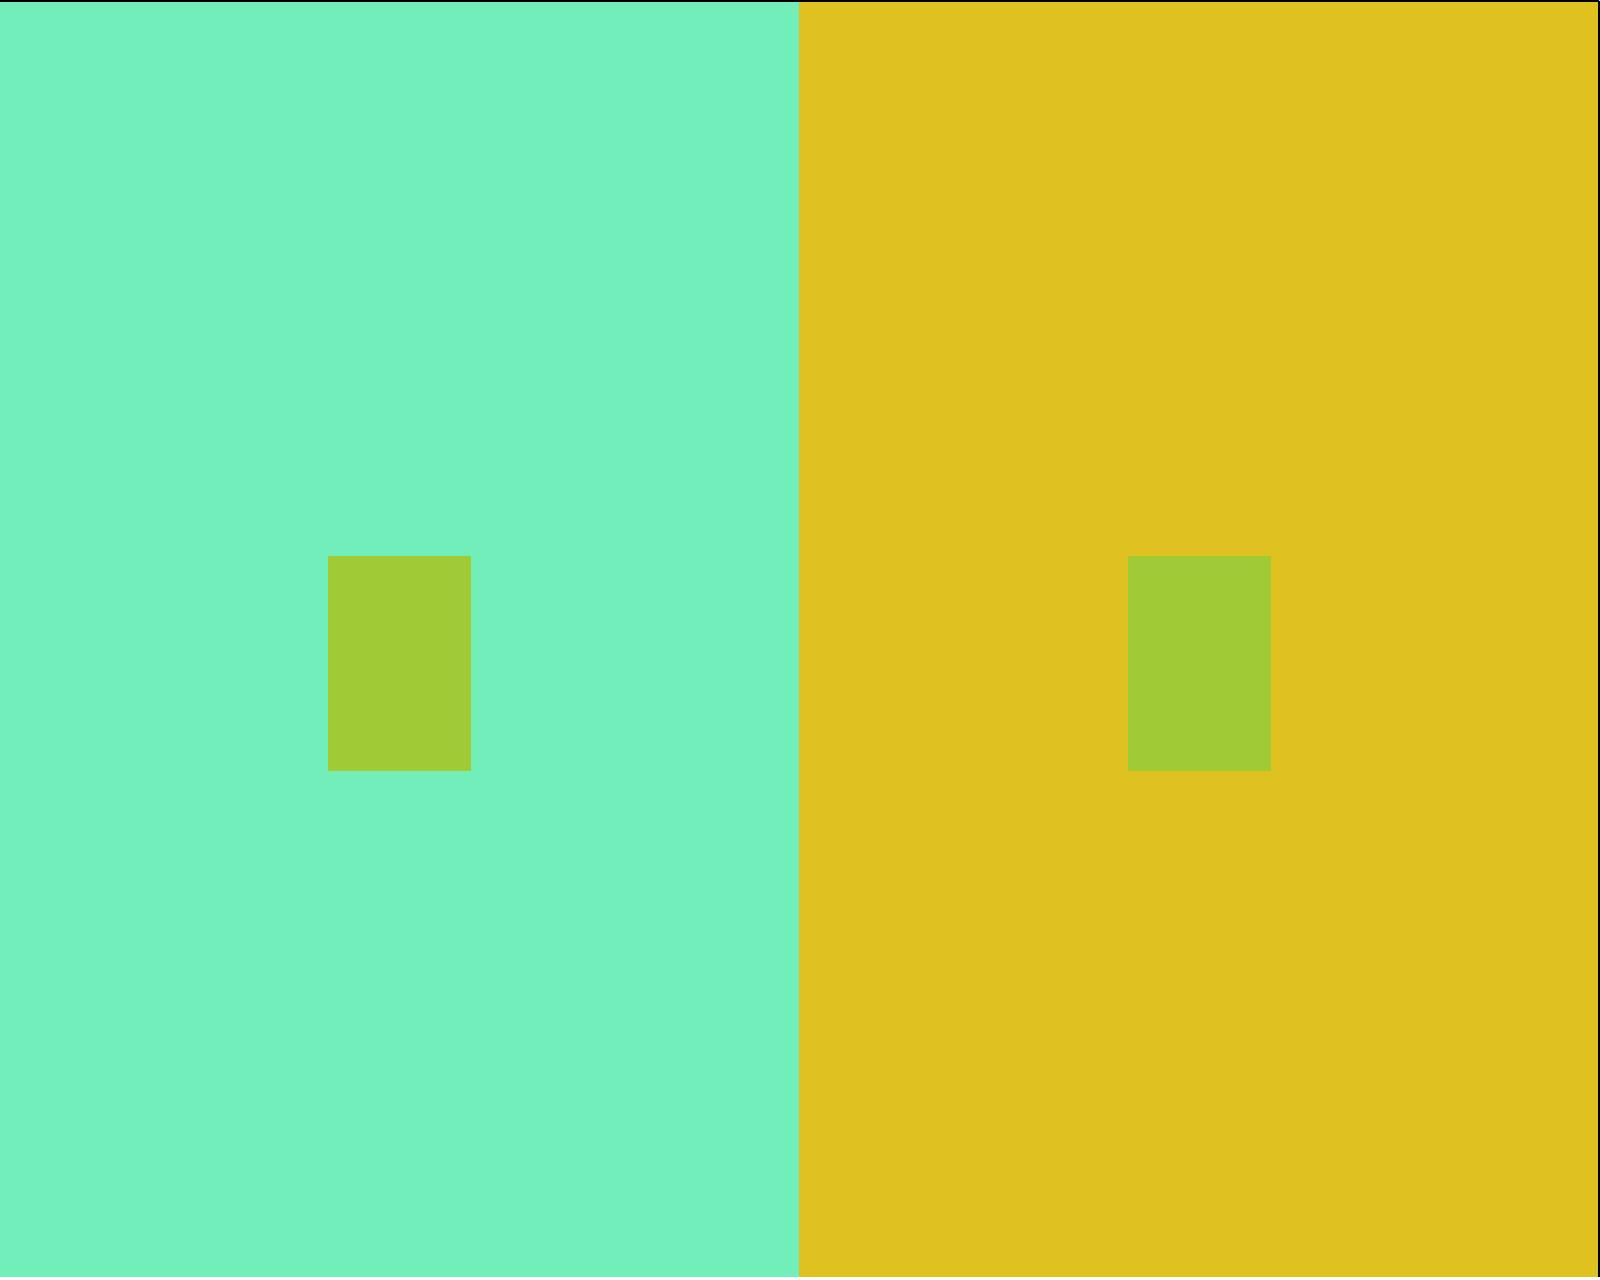 обман зрения цветами при смешивании цветов